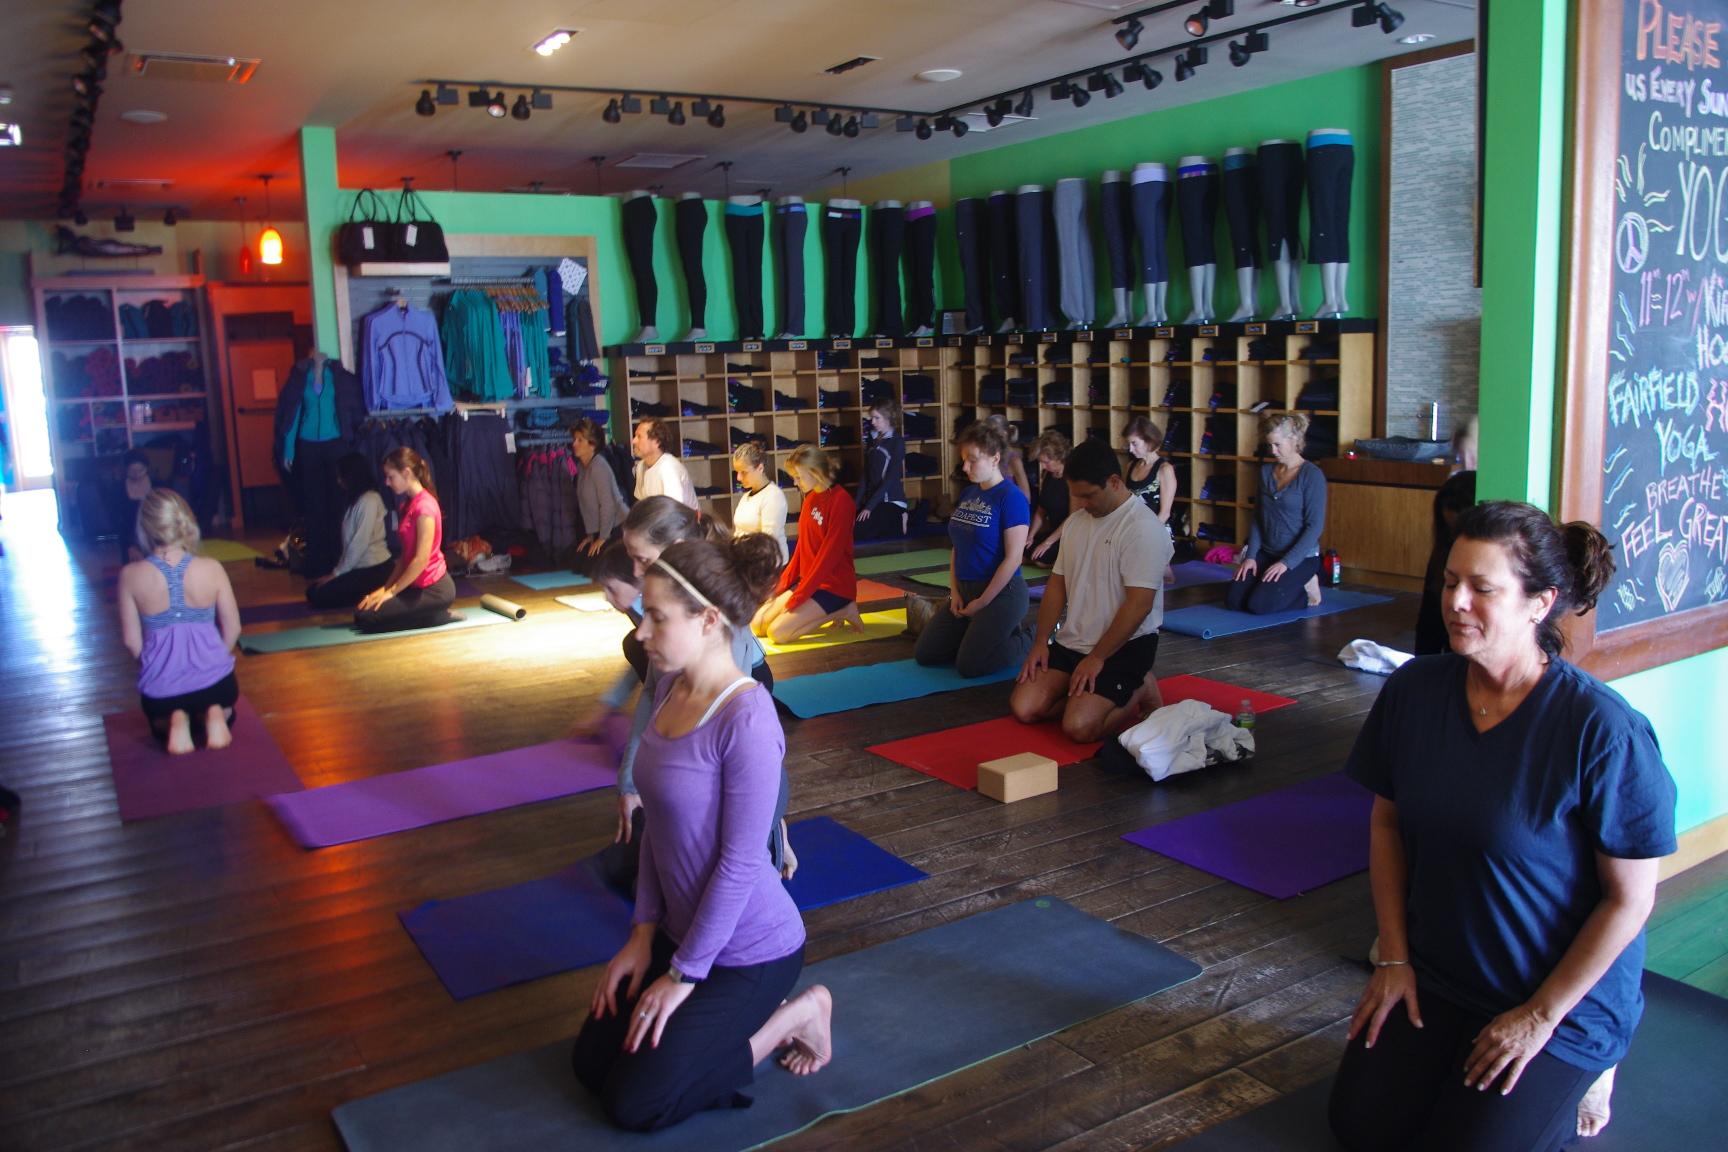 lululemon in-store yoga